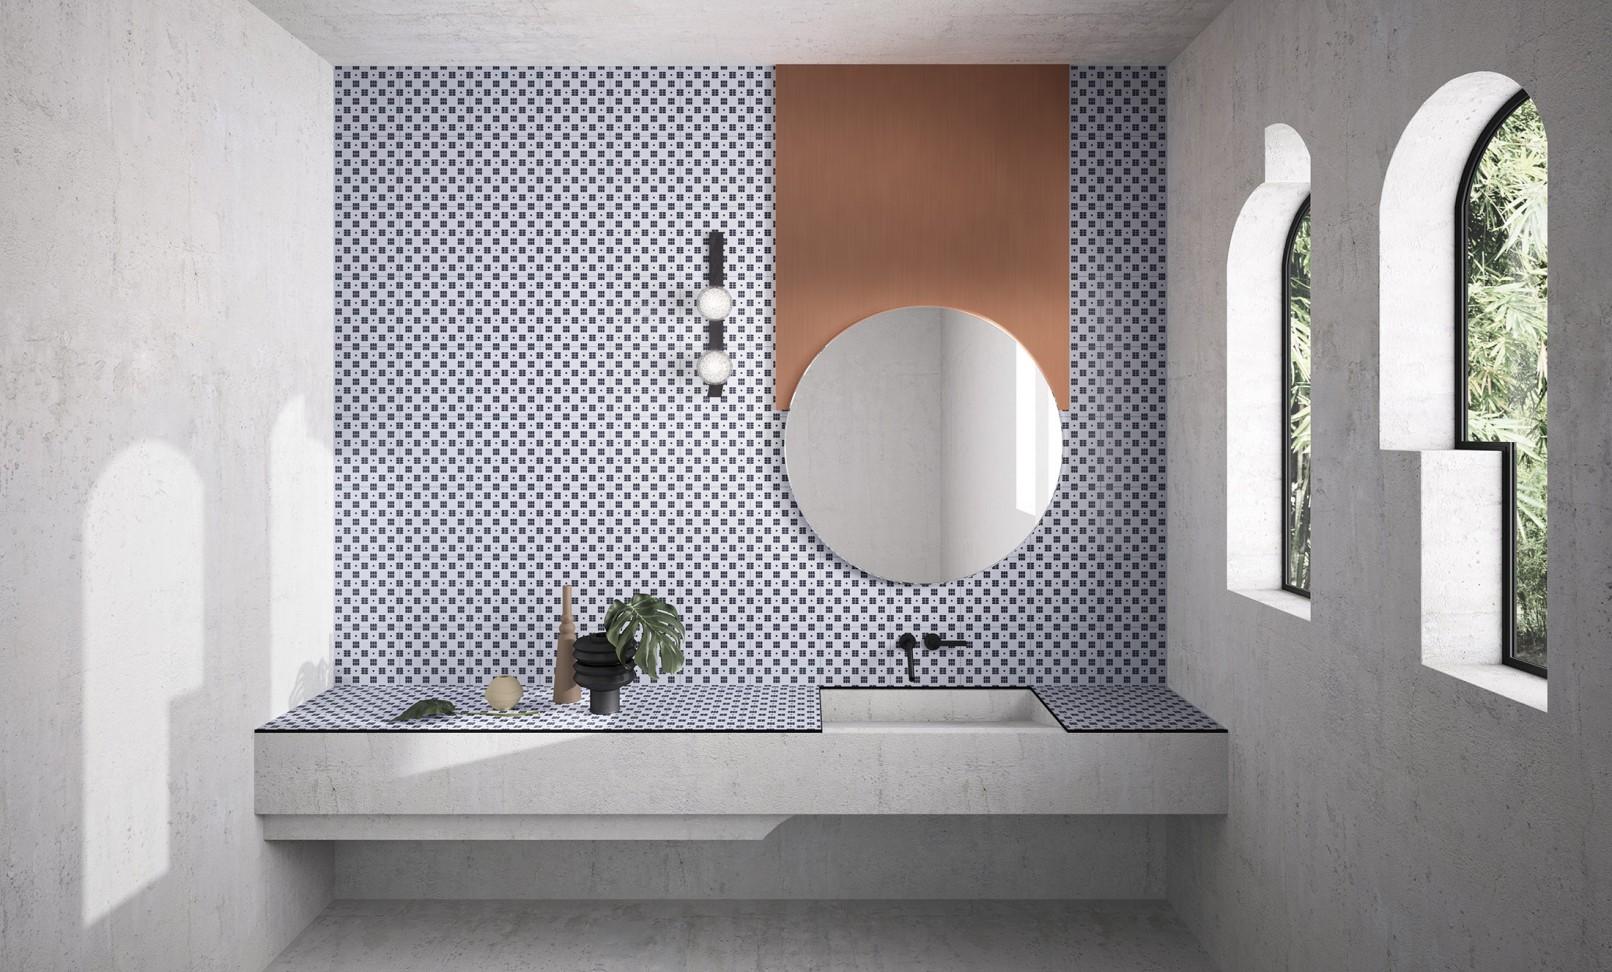 House of tiles marcante testa architetti for Arredo bongiorni